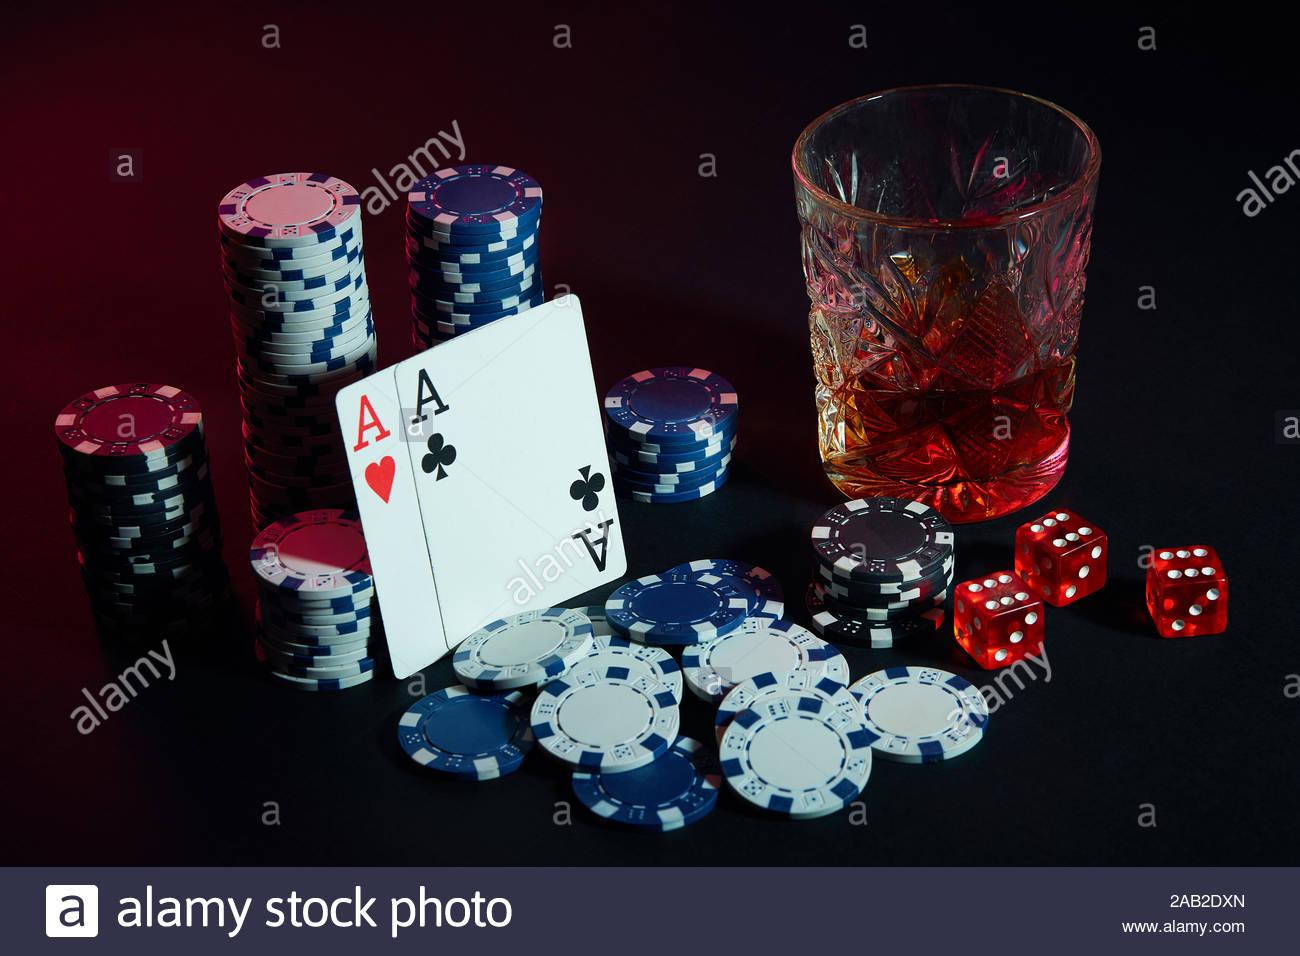 Filthy Realities Regarding Gambling Revealed